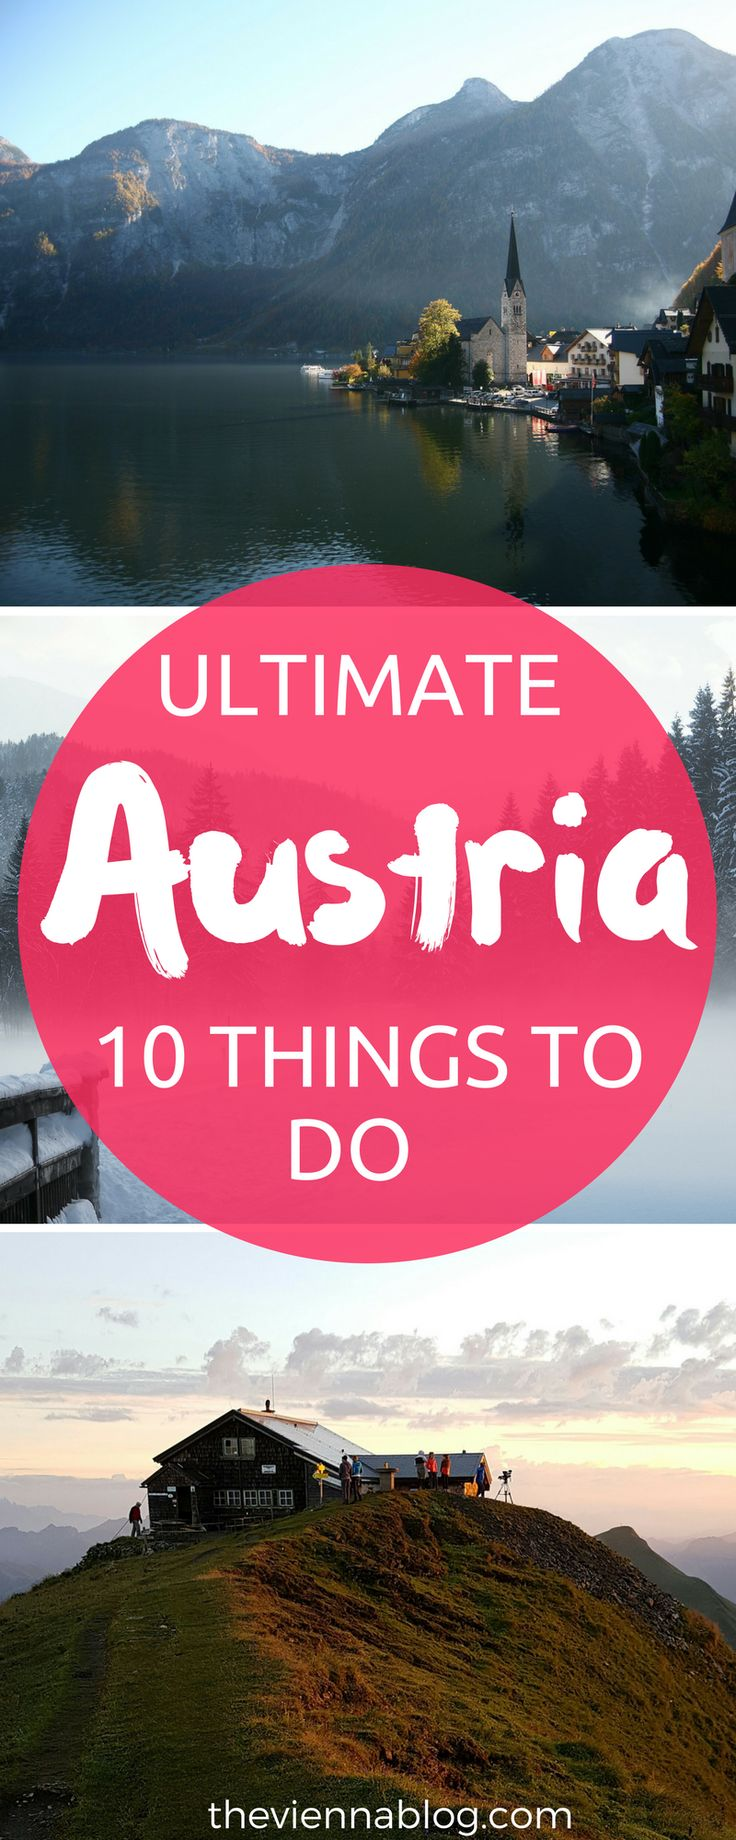 Austria Travel Guide, Austria Top things to do and see, ##vienna#Wien #Salzburg #Austria#Hallstatt #photography#beautifuldestinations#beautifulphotos#Opera#theviennablog#wonderfulplaces #amazing  #gregsideris #beautiful #photooftheday #vienne #österreich #europe #Tirol #Tyrol #Neusiedlersee